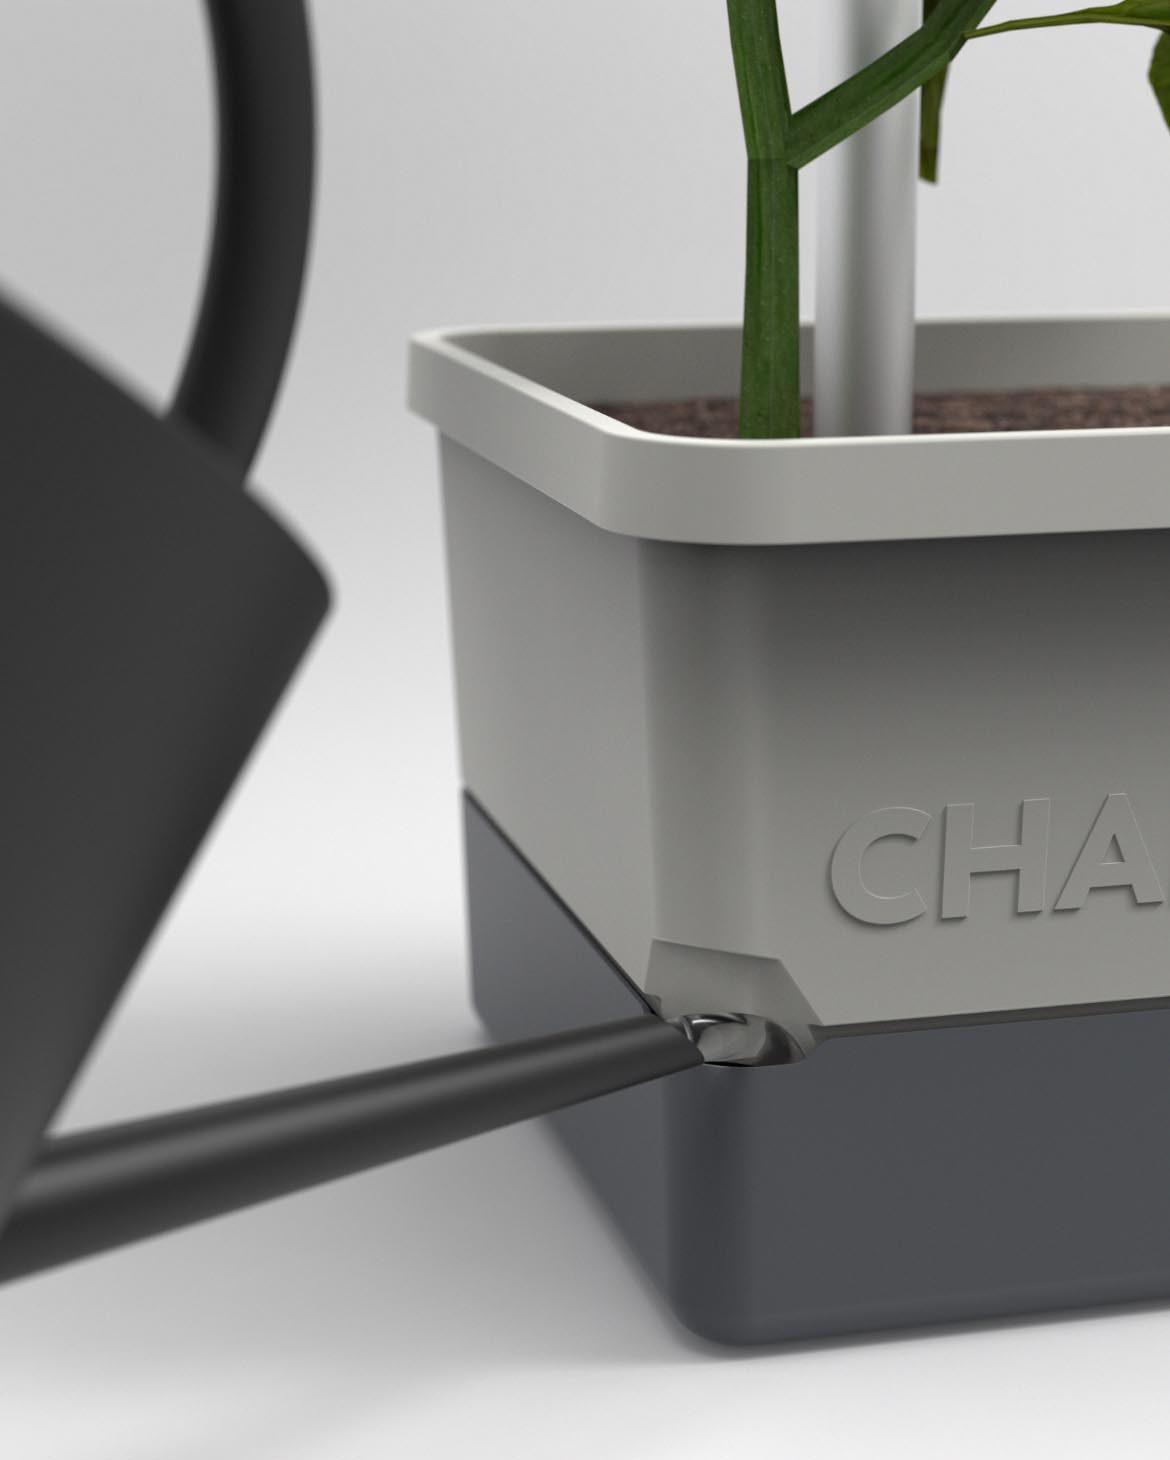 Charly-Chili-Gießen